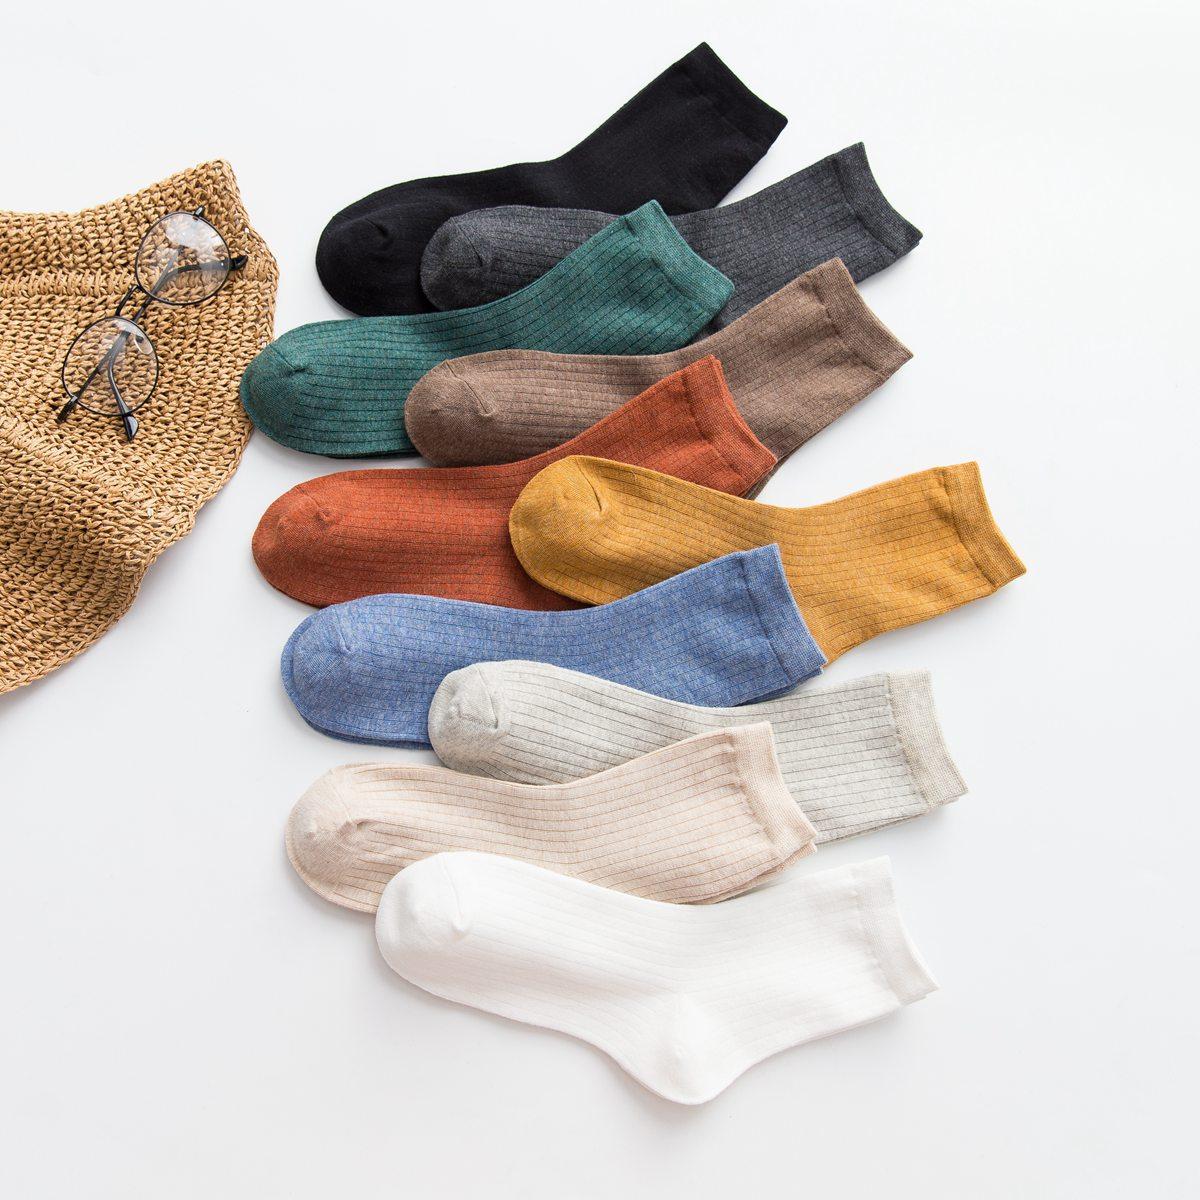 Cotton female tube socks pure color brand double needle Japanese female socks cotton manufacturers socks wholesale